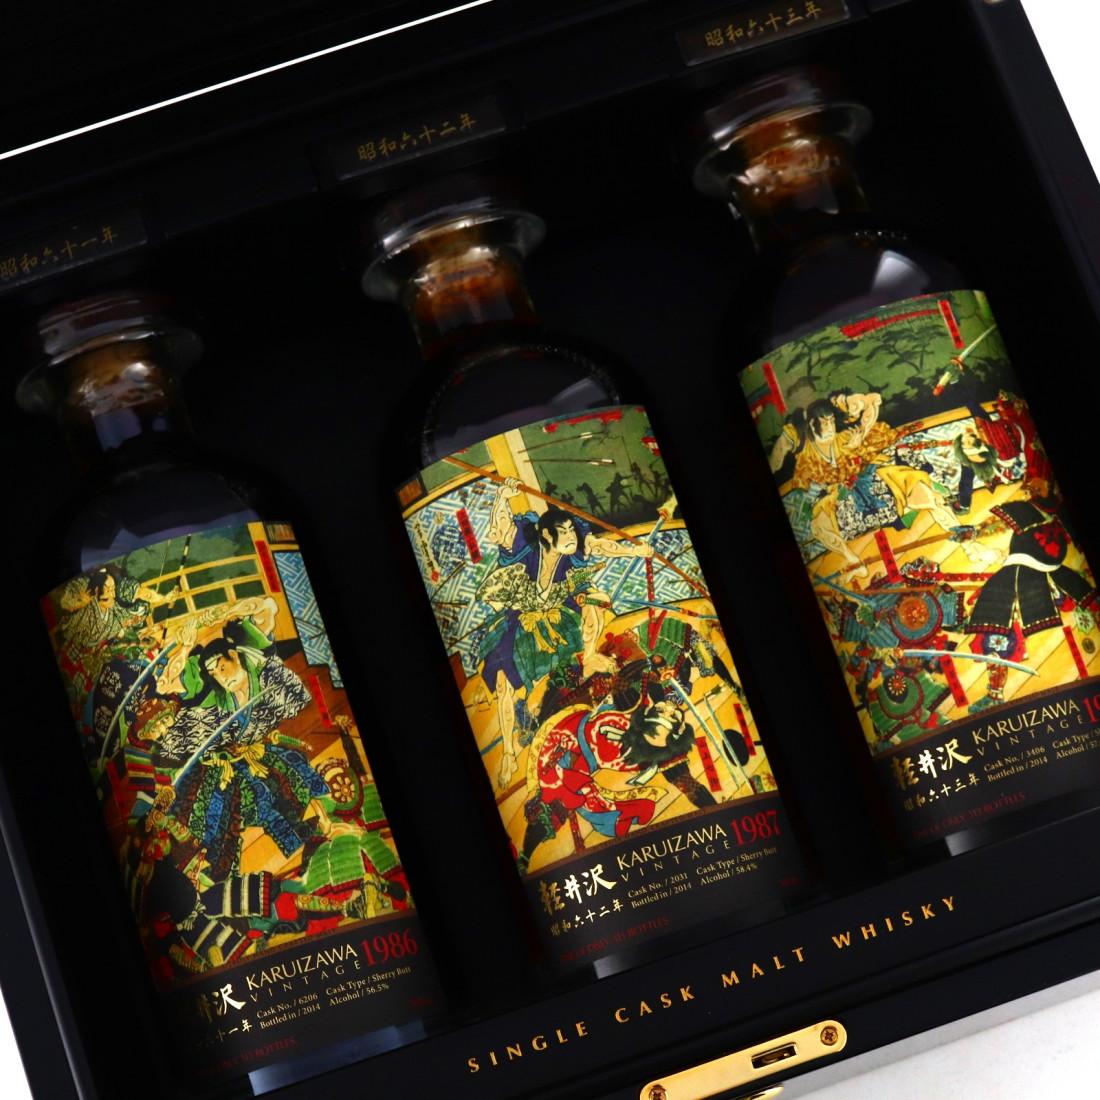 Karuizawa 1986-1988 Fight Club Collection 3 x 70cl